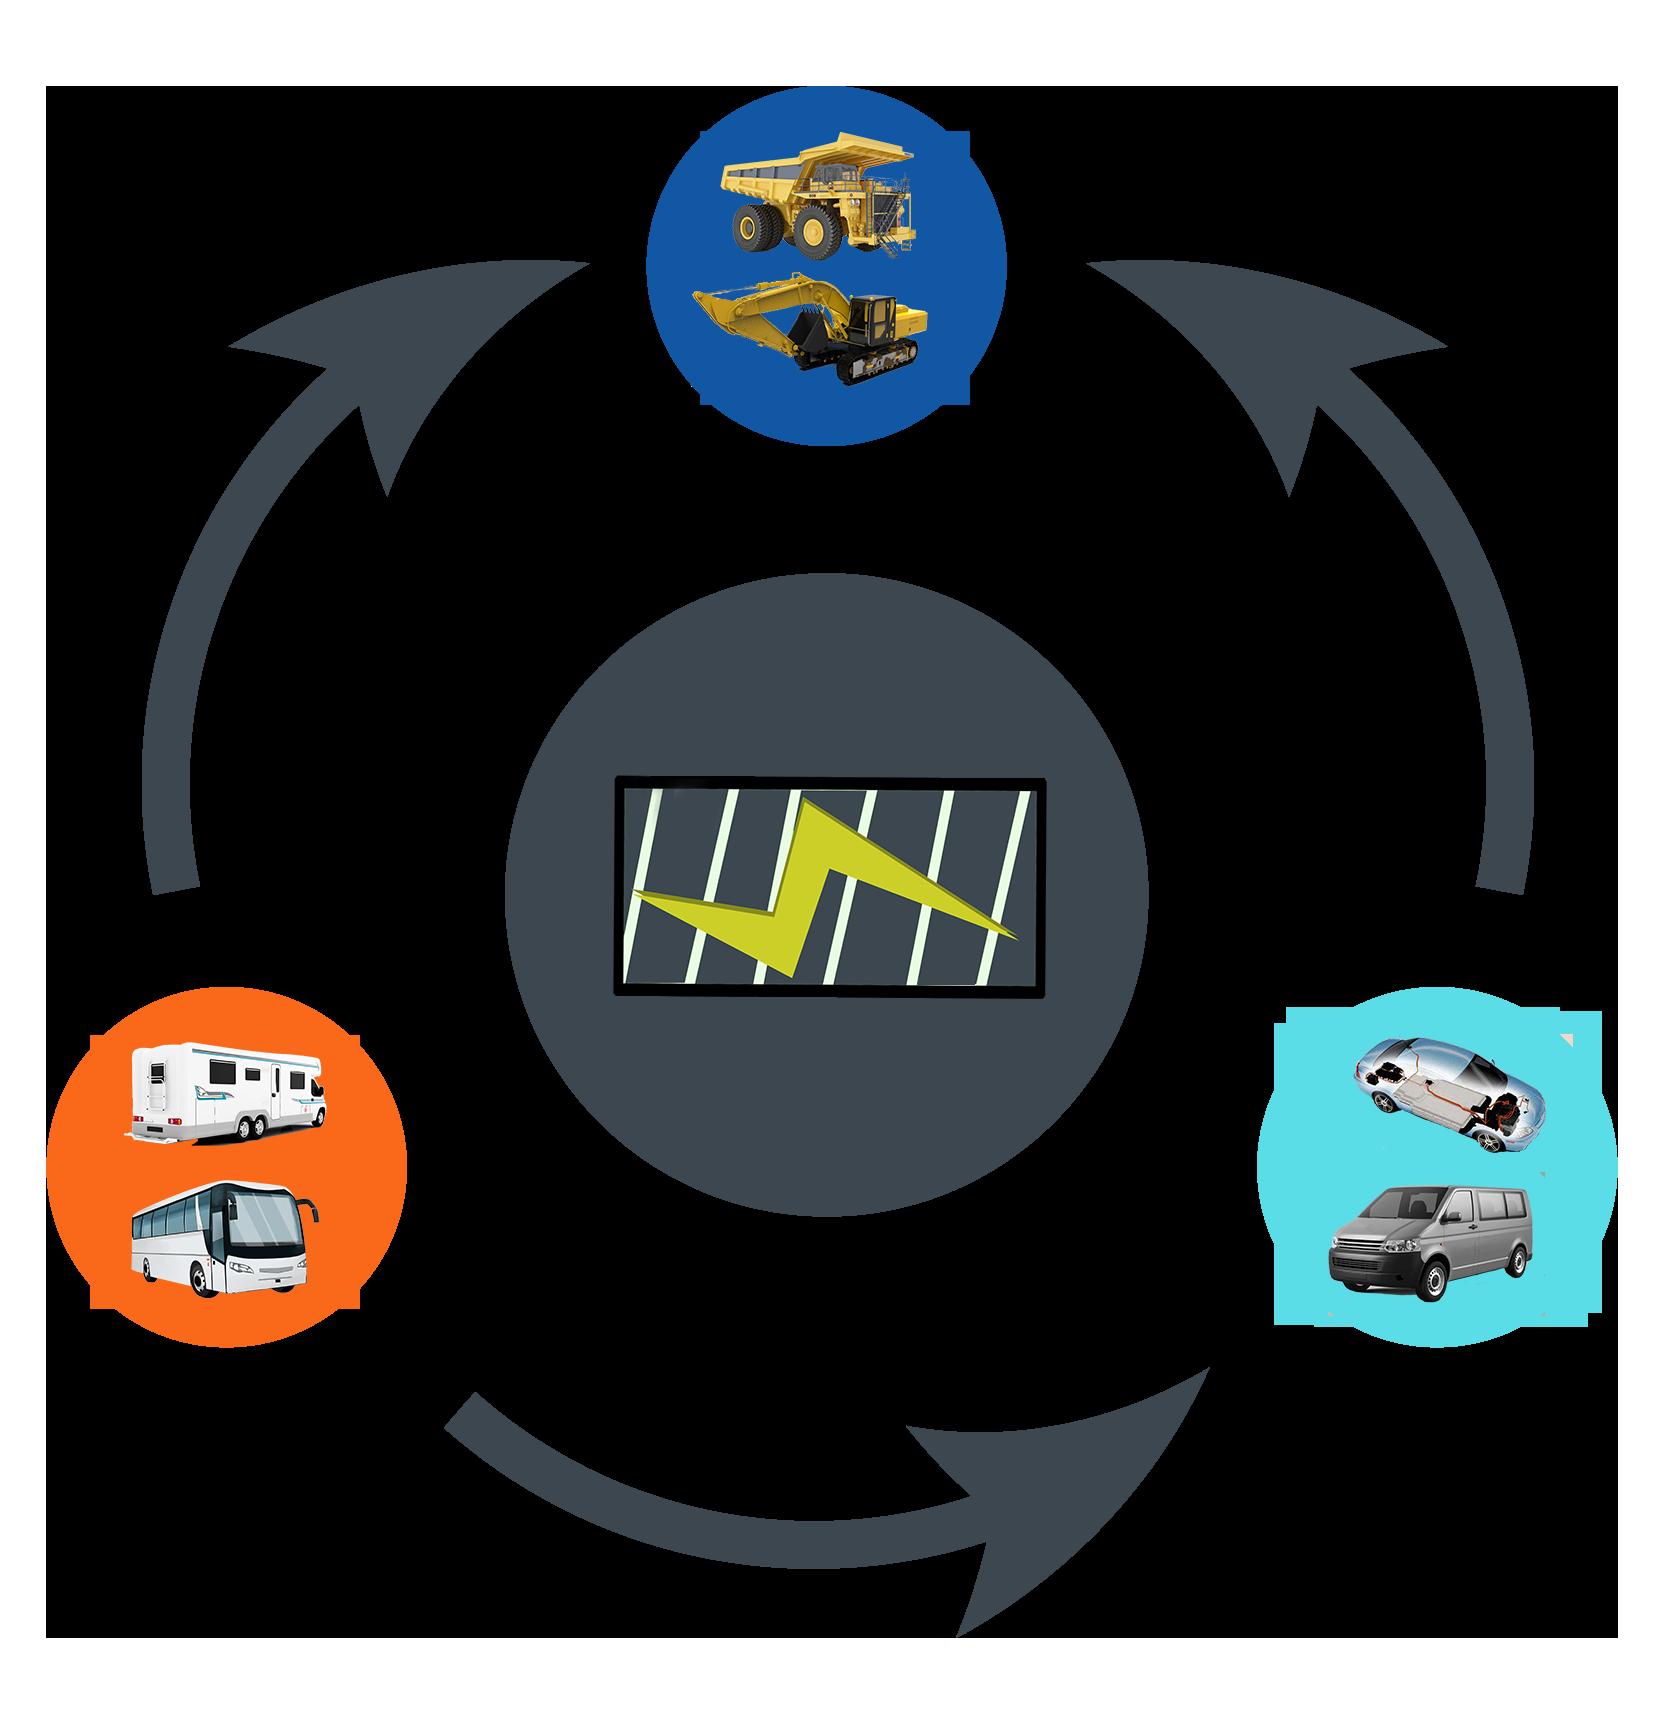 PPT循環分析圖表插圖